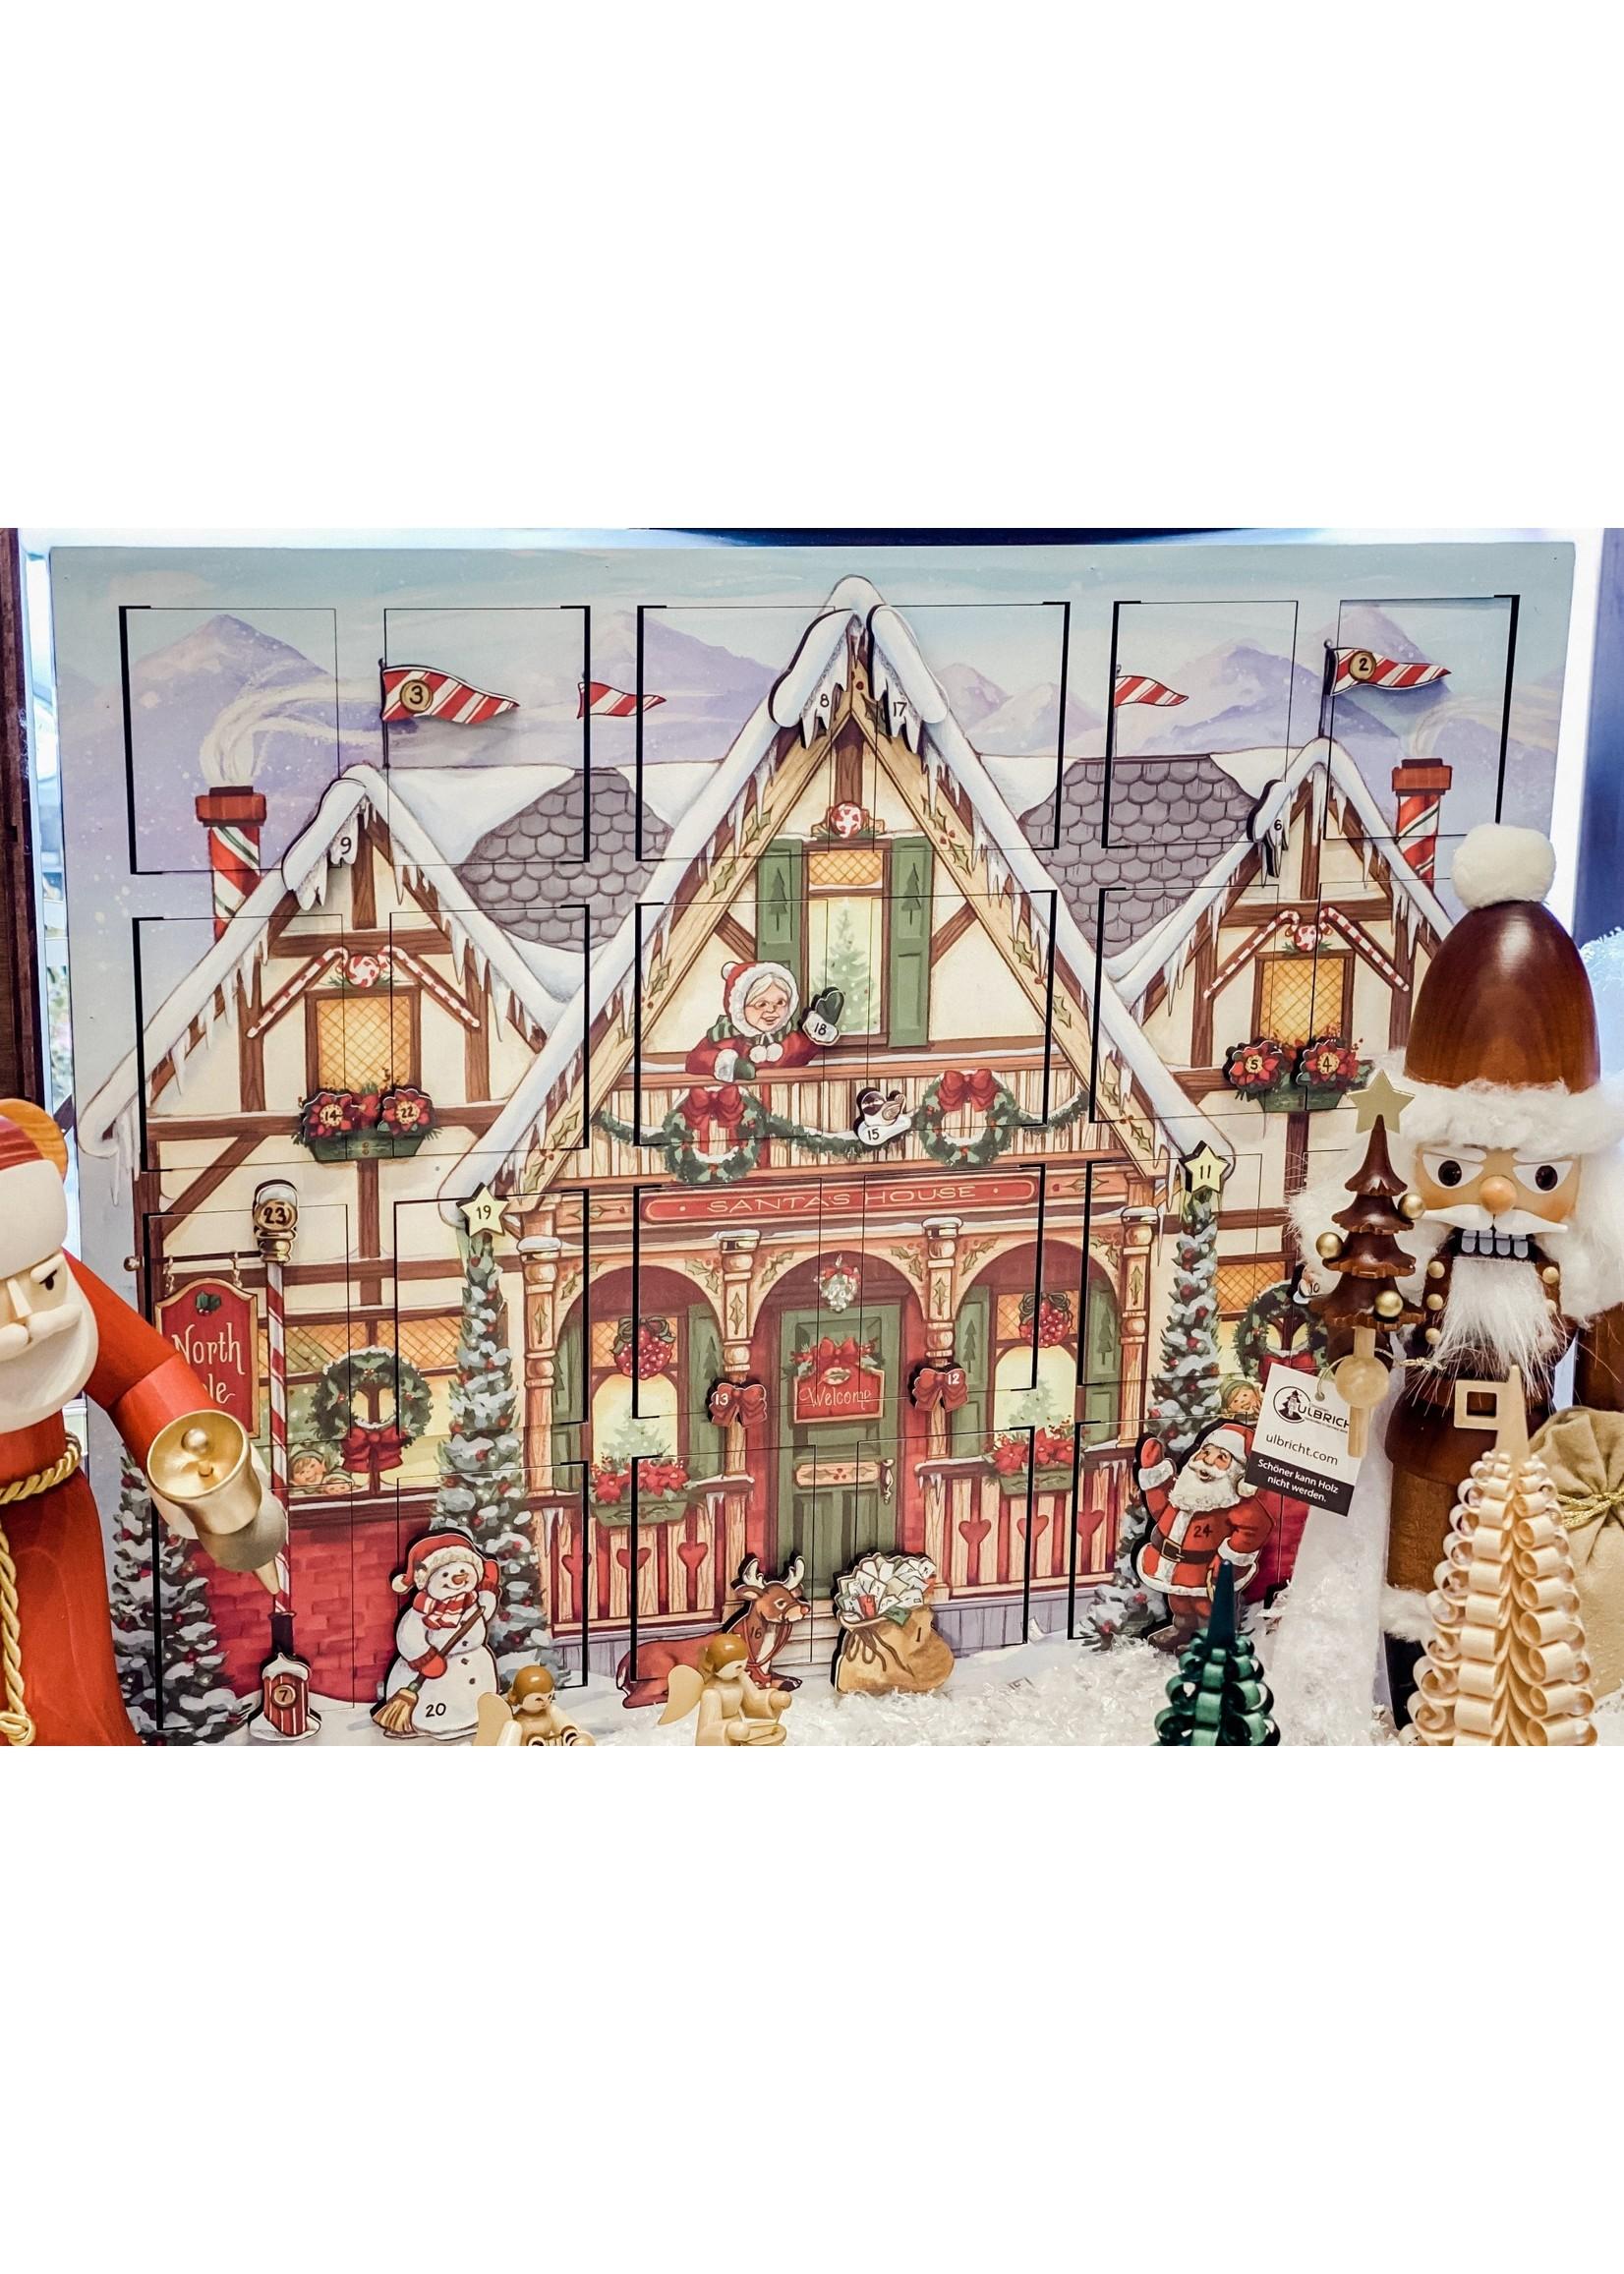 North Pole Advent